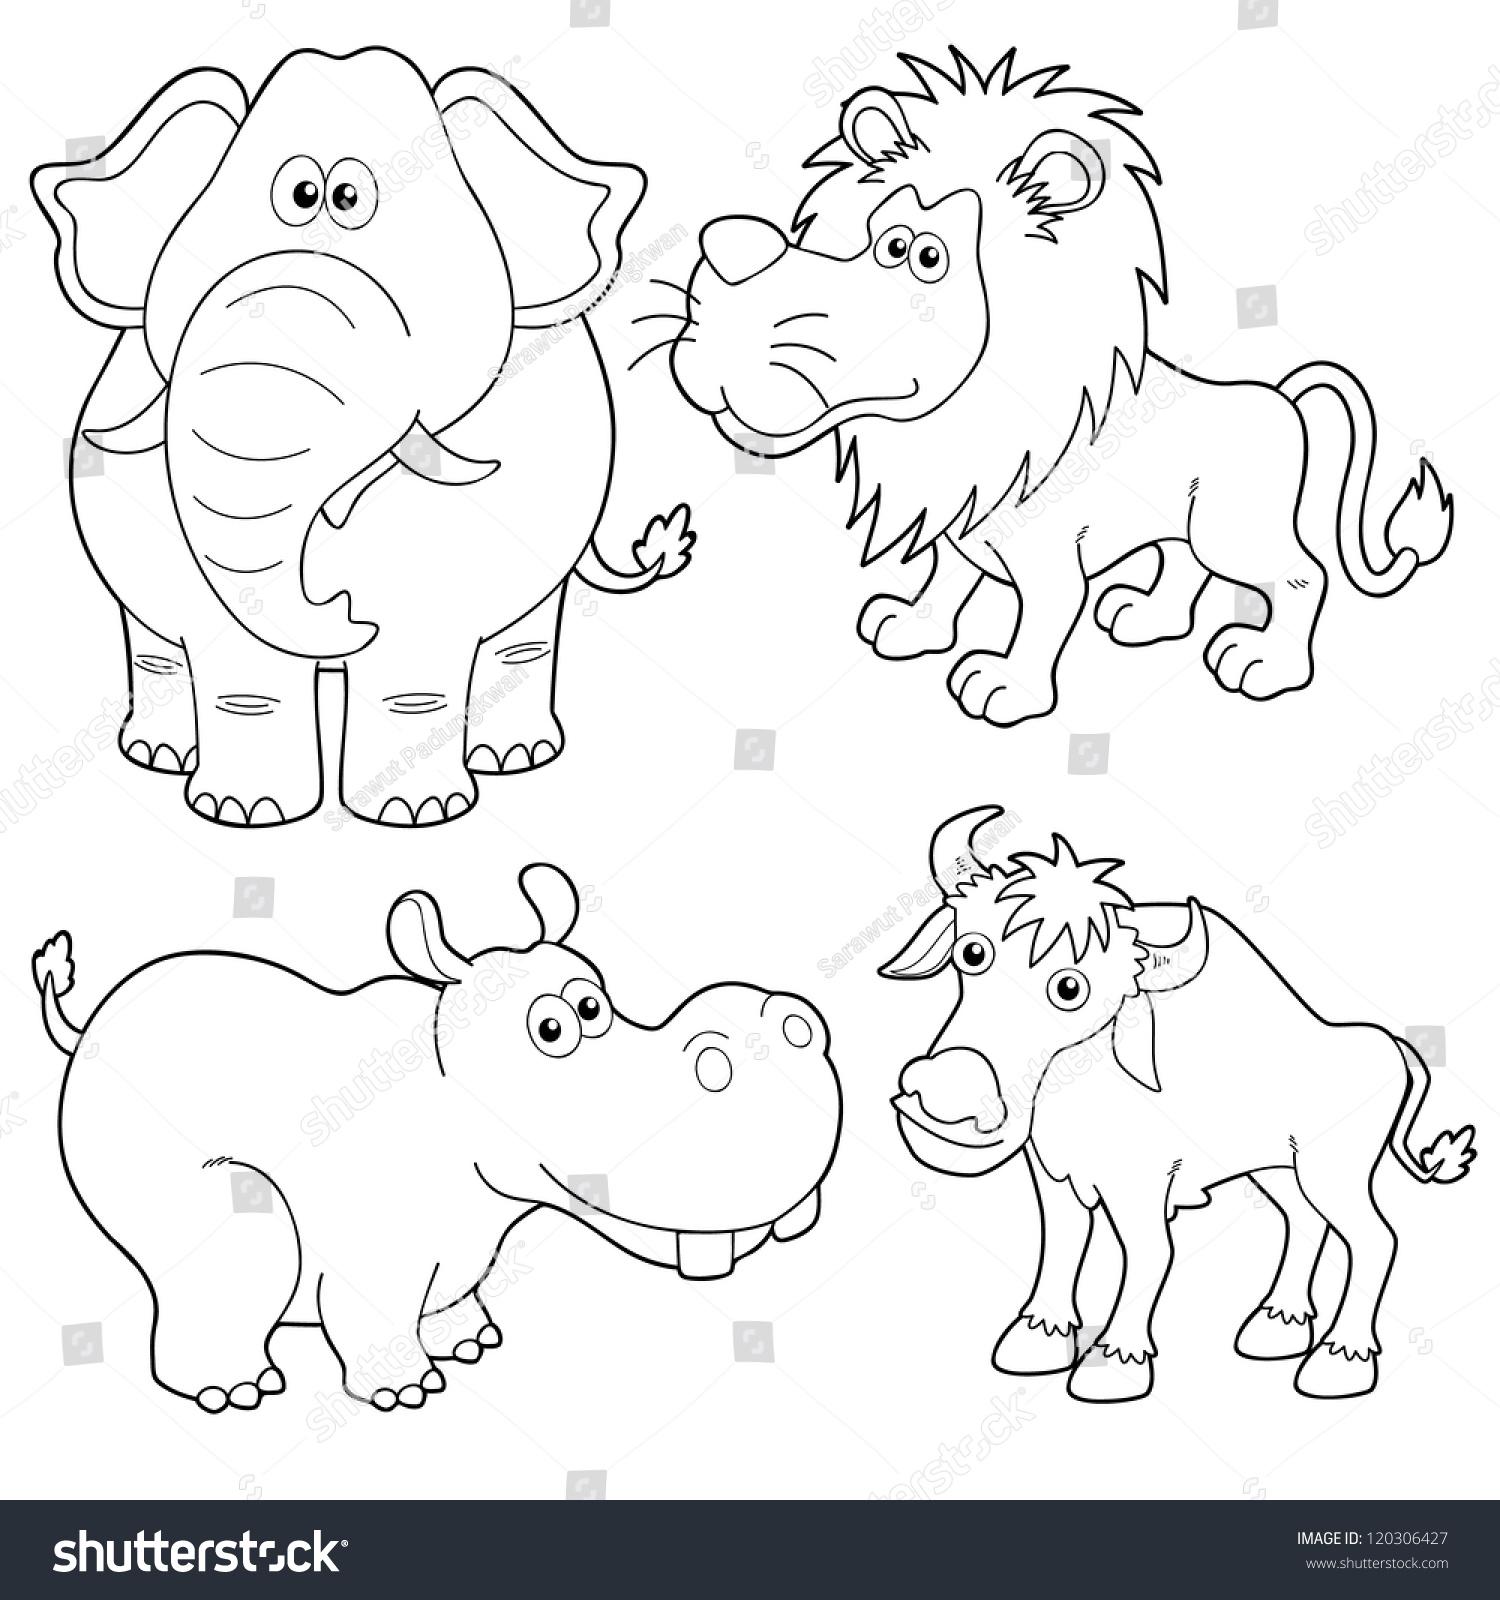 Royalty Free Illustration Of Wild Animals Cartoons 120306427 Stock